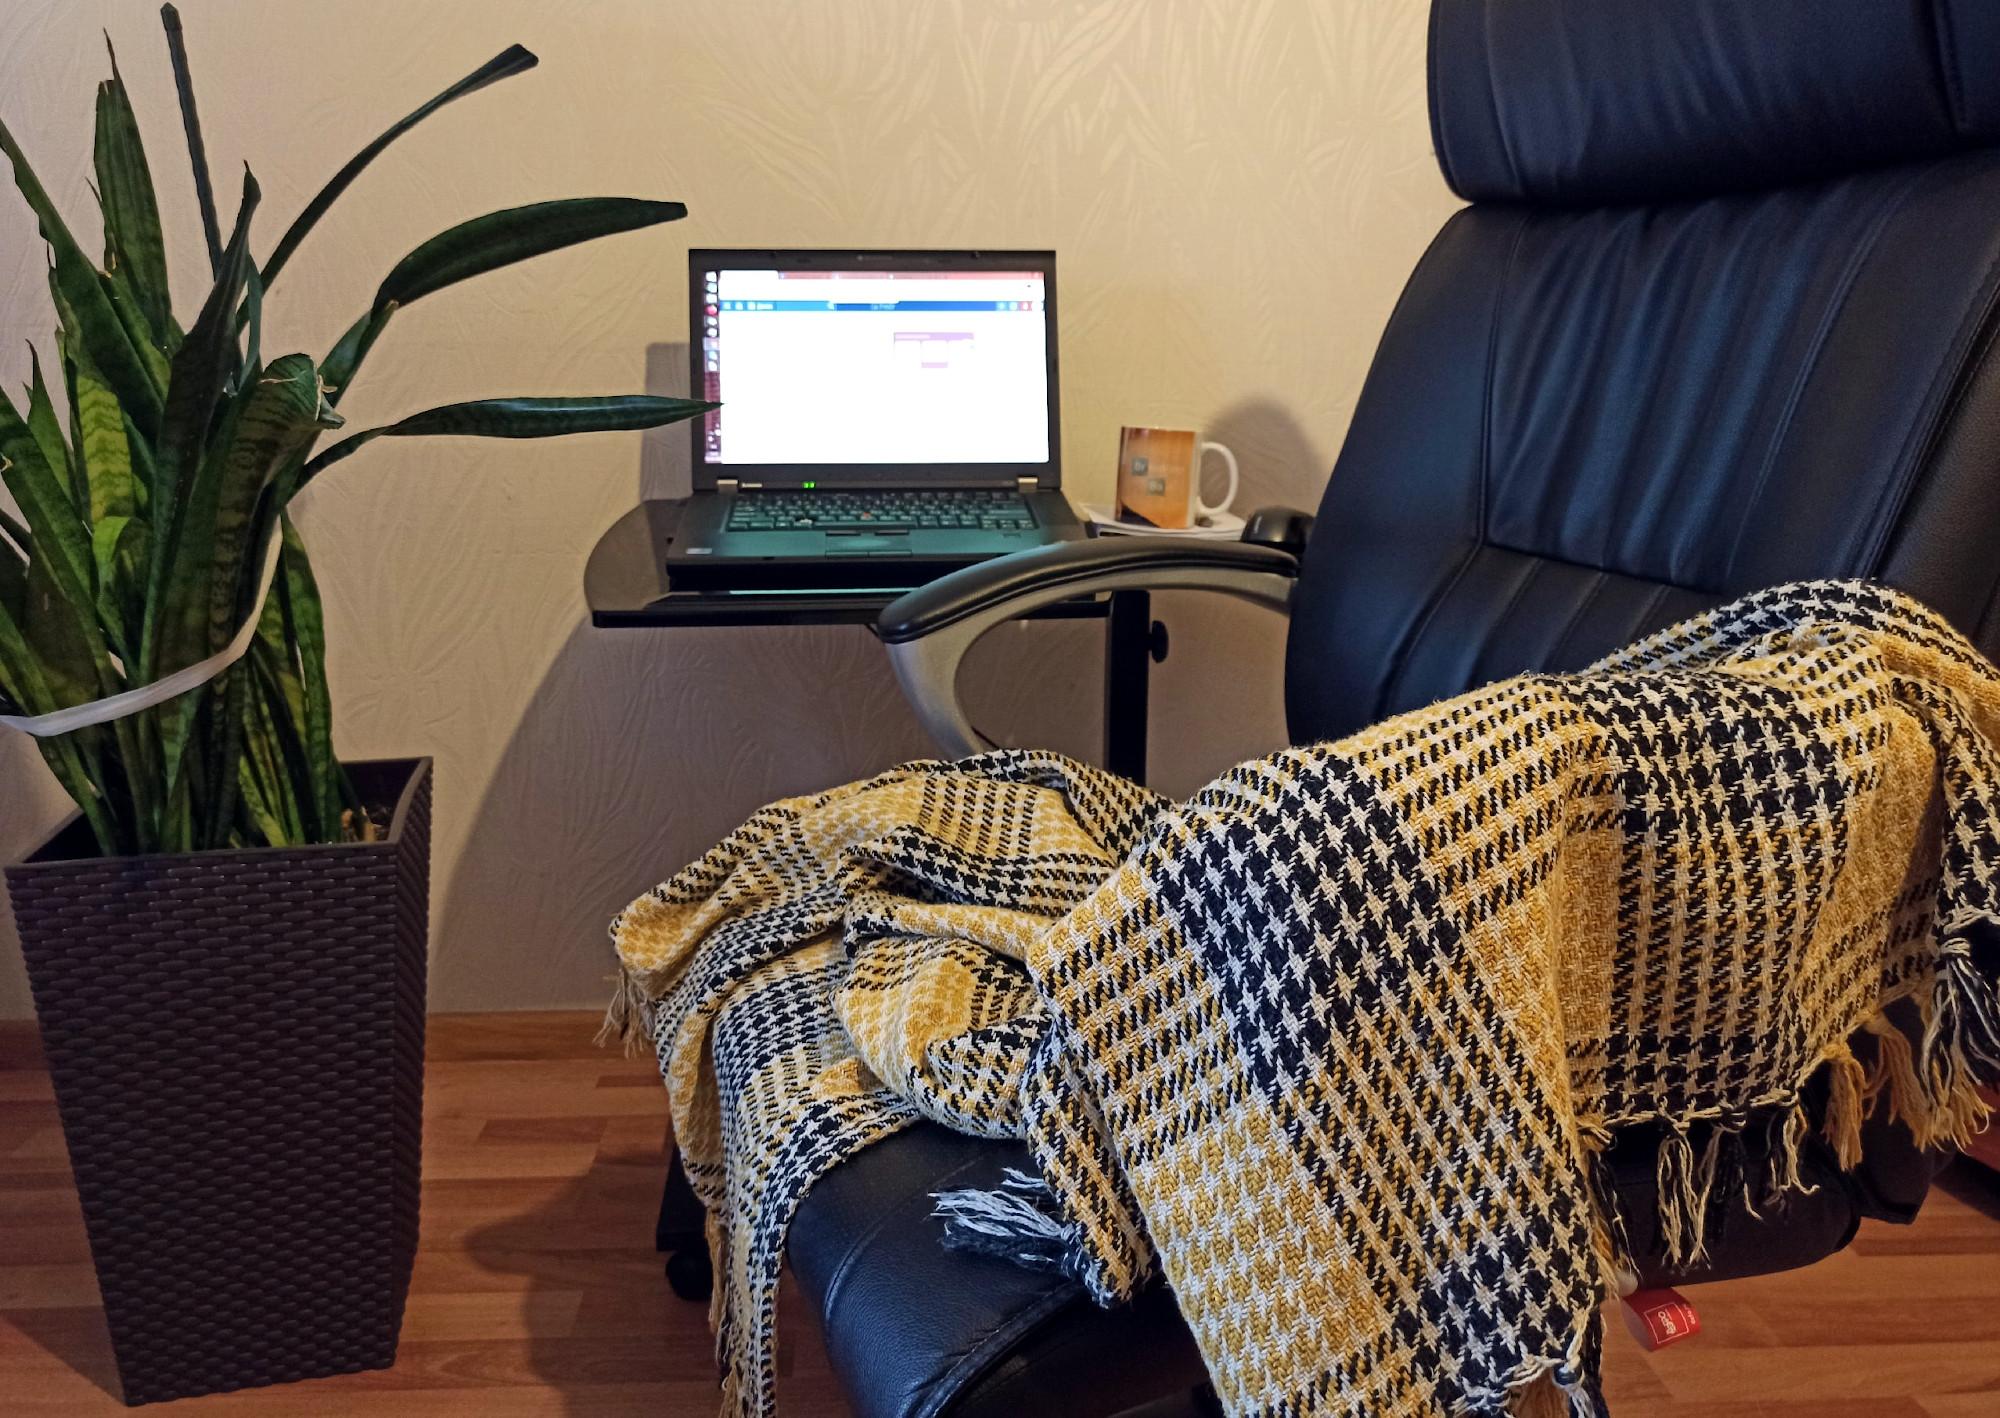 рабочее место, компьютер, изоляция, карантин